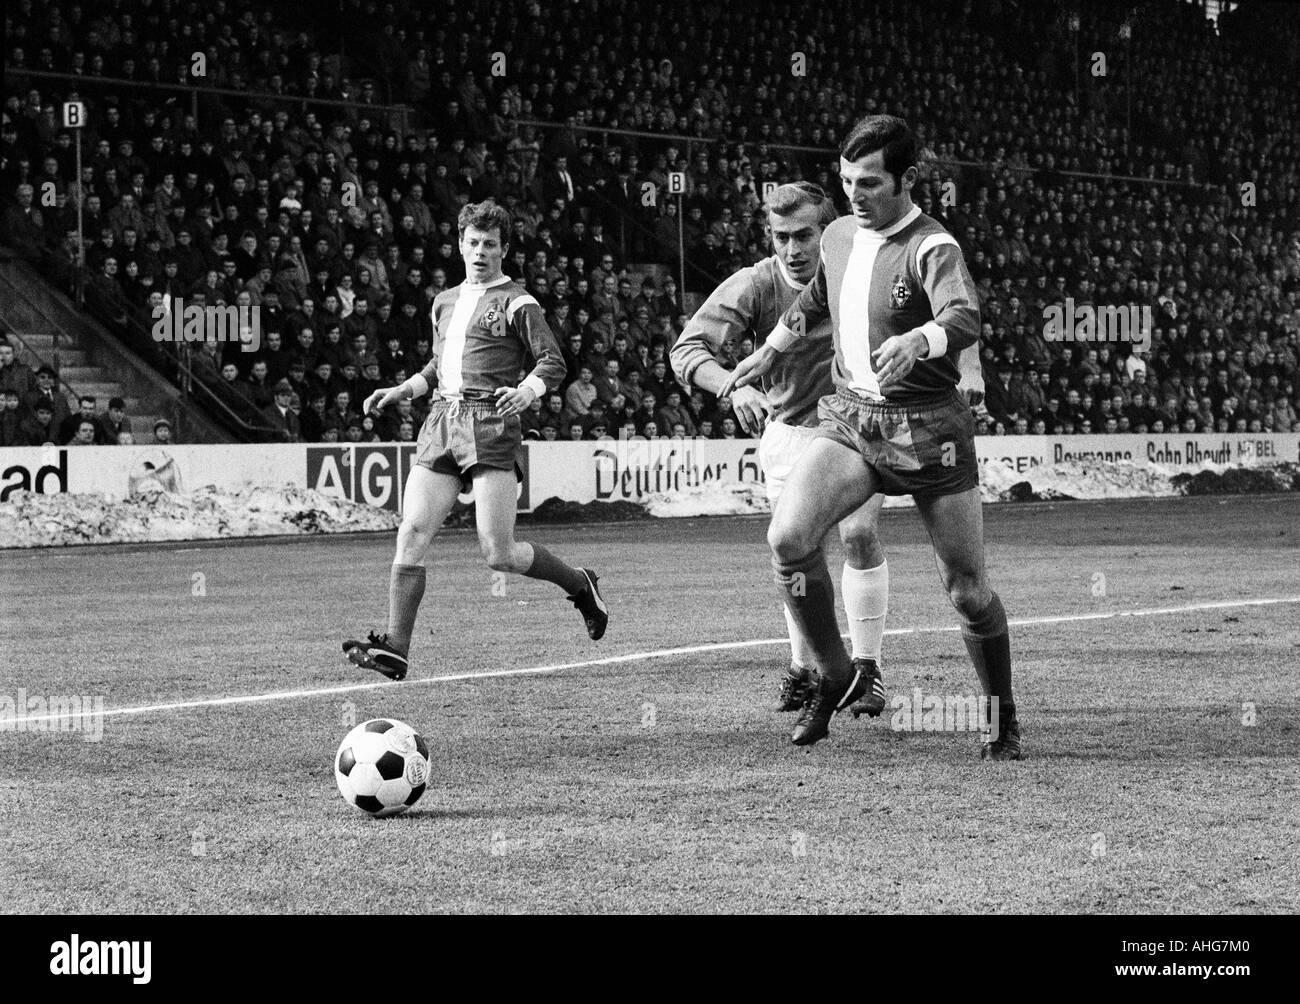 football, Bundesliga, 1969/1970, Borussia Moenchengladbach versus 1860 Munich 3:1, Boekelberg Stadium, scene of the match, f.l.t.r. Herbert Wimmer (Gladbach), Horst Blankenburg (1860), Ludwig Mueller (Gladbach) - Stock Image